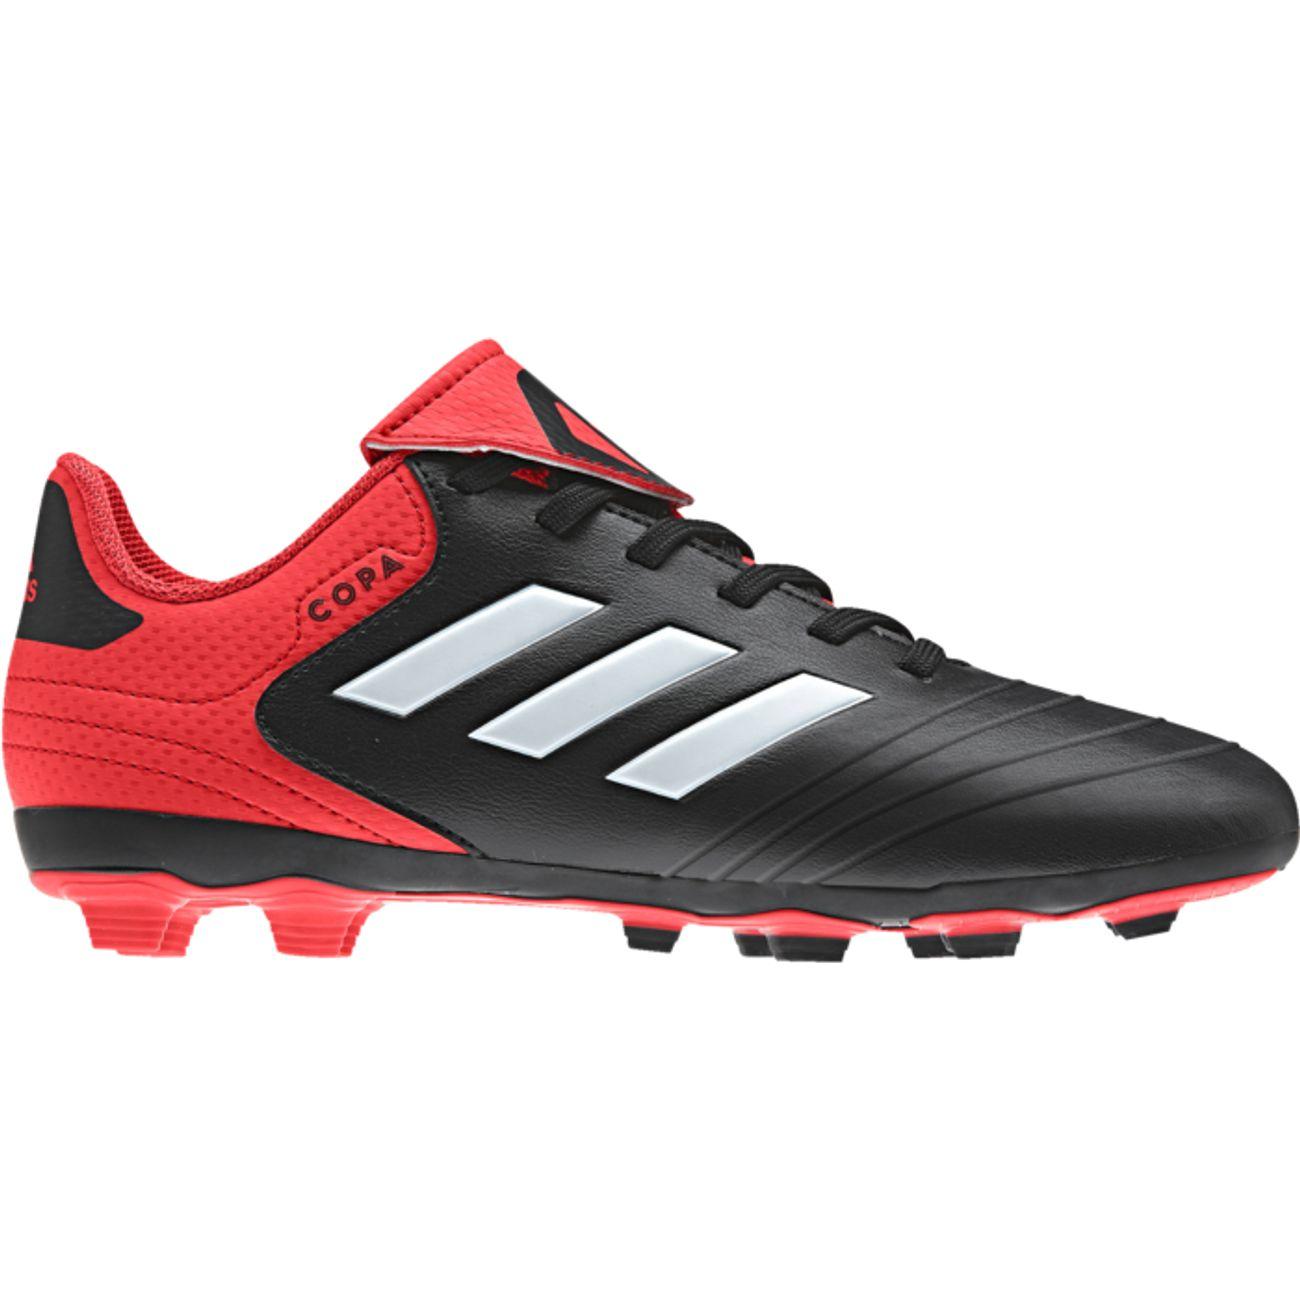 on sale 227bb 39fd8 CHAUSSURE FOOTBALL ENFANT ADIDAS COPA 18.4 FxG ...